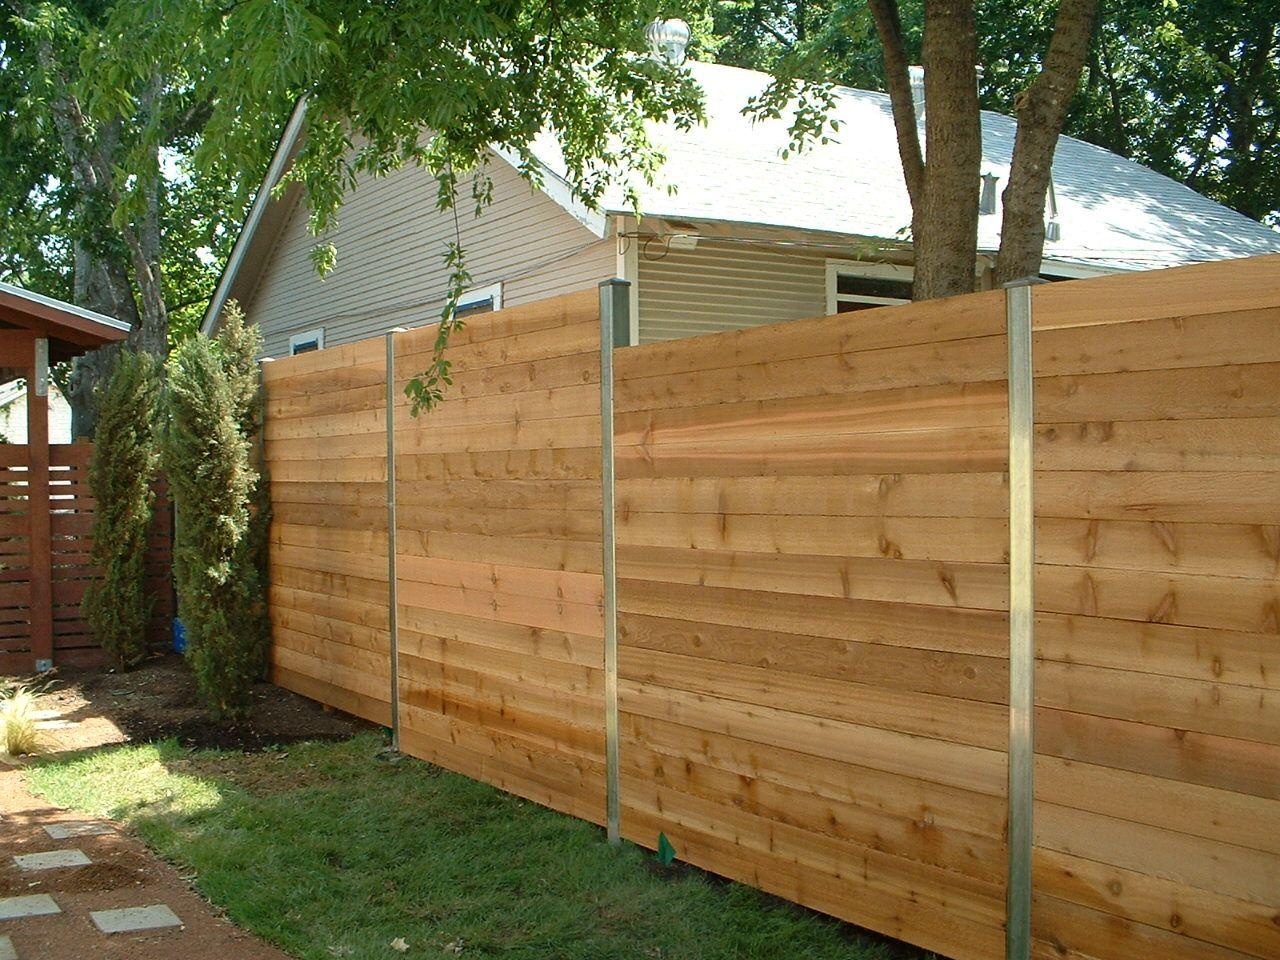 Fence252520pictures252520021jpg 1280960 cedar